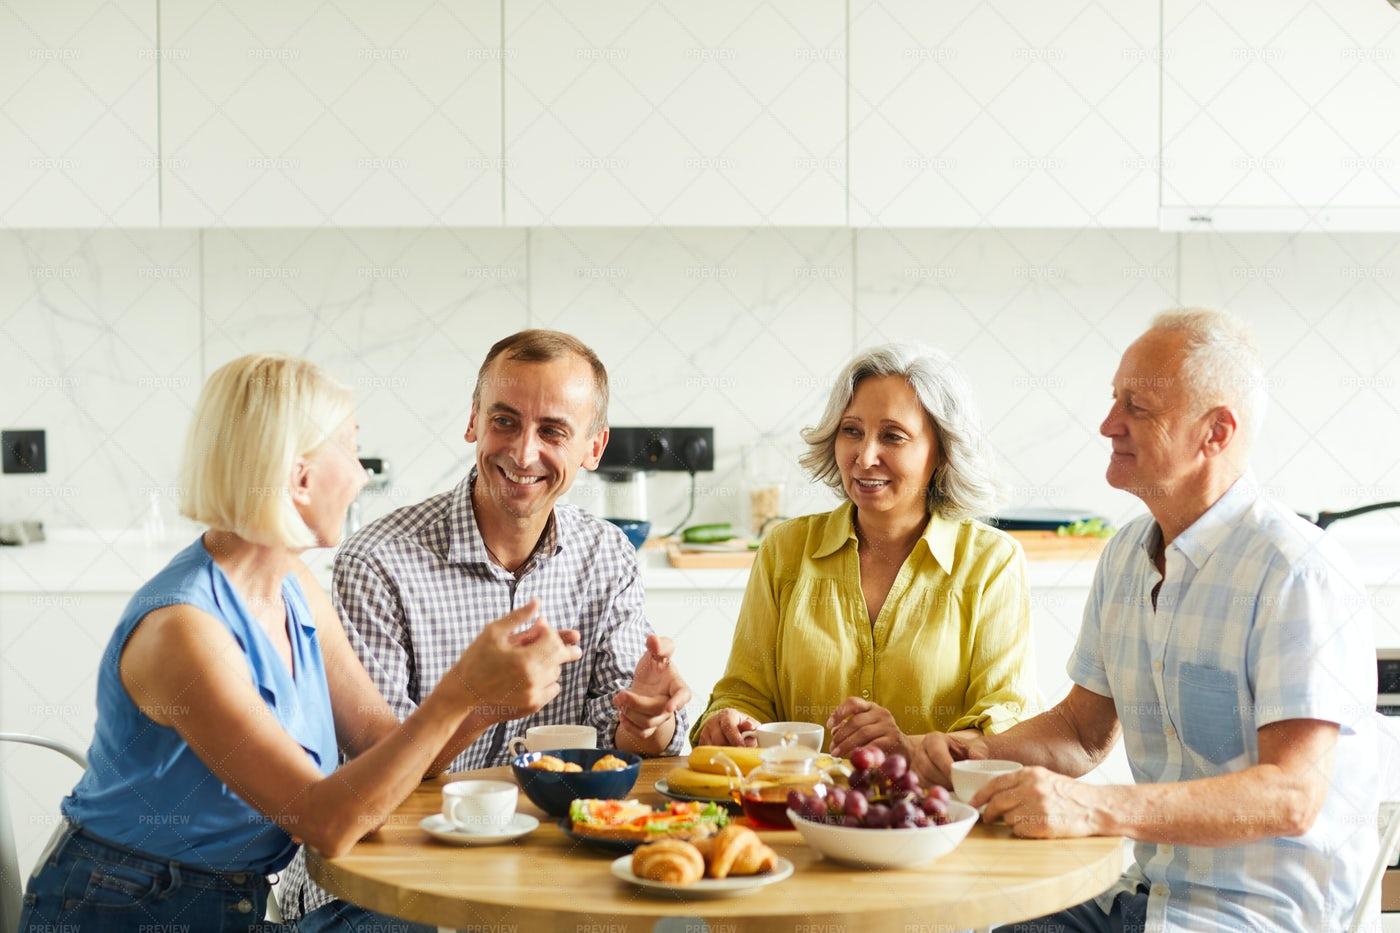 Mature Friends Gathered At Kitchen...: Stock Photos